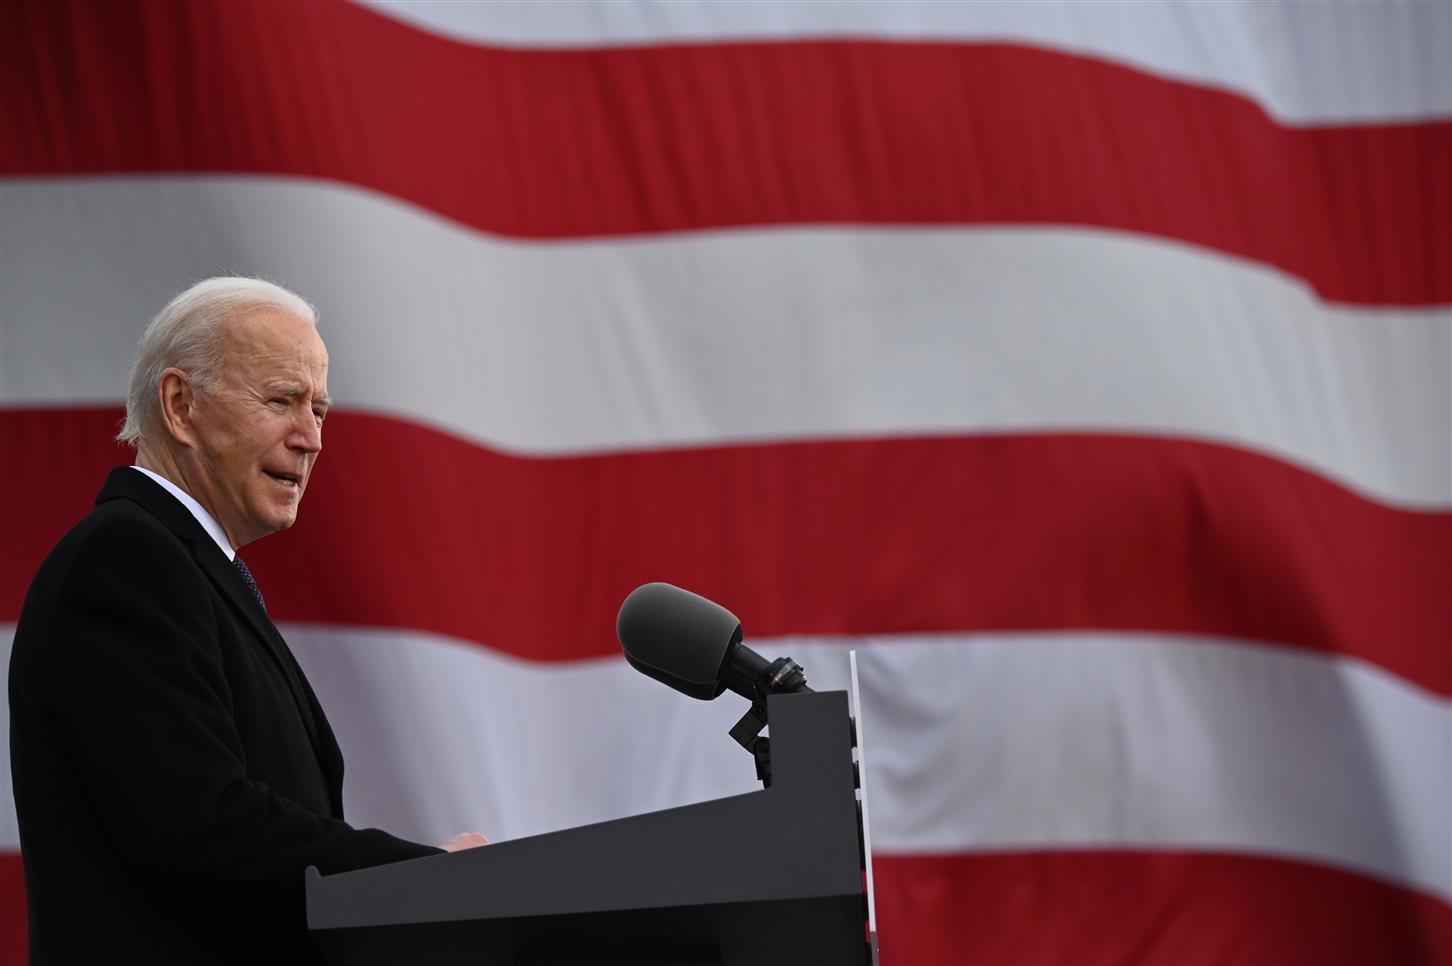 78-Yr-Old Biden Oldest Us Prez To Take Oath